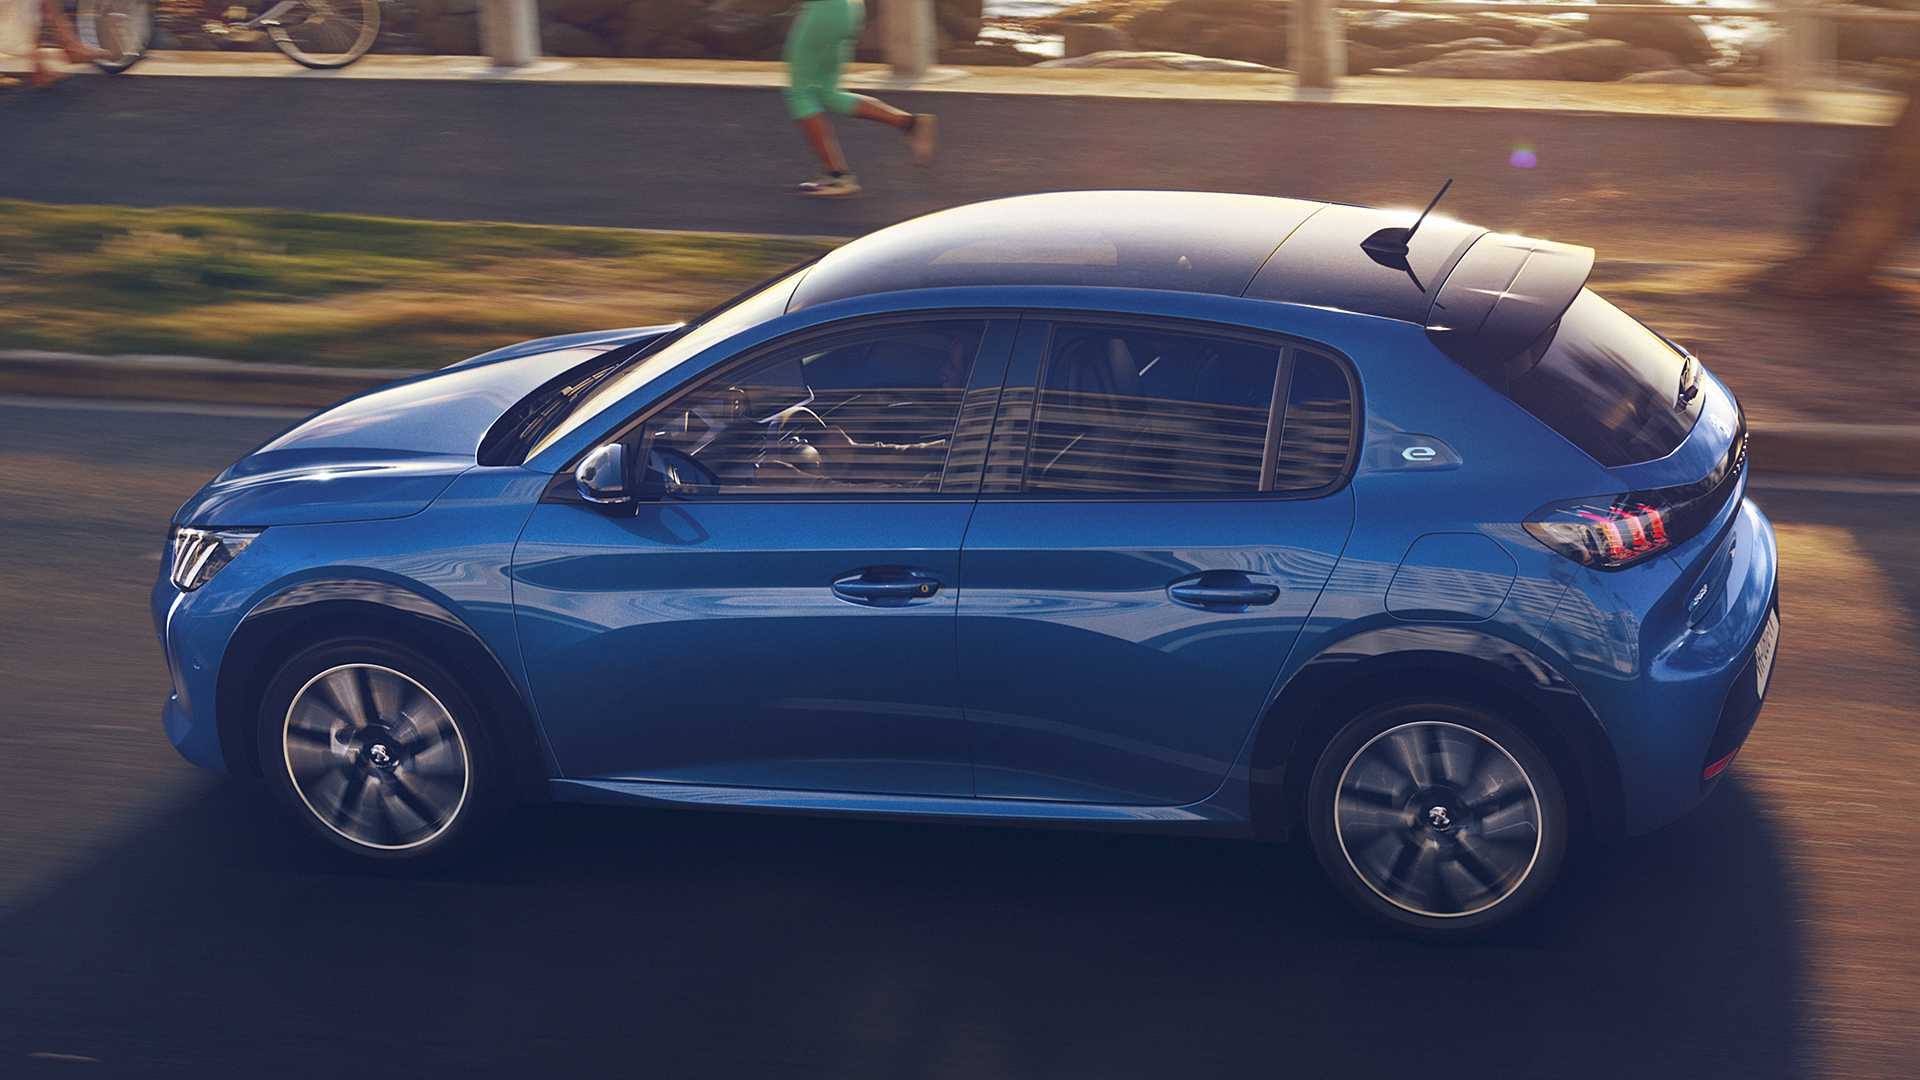 2020 Peugeot e-208 EV Side Wallpapers (8)